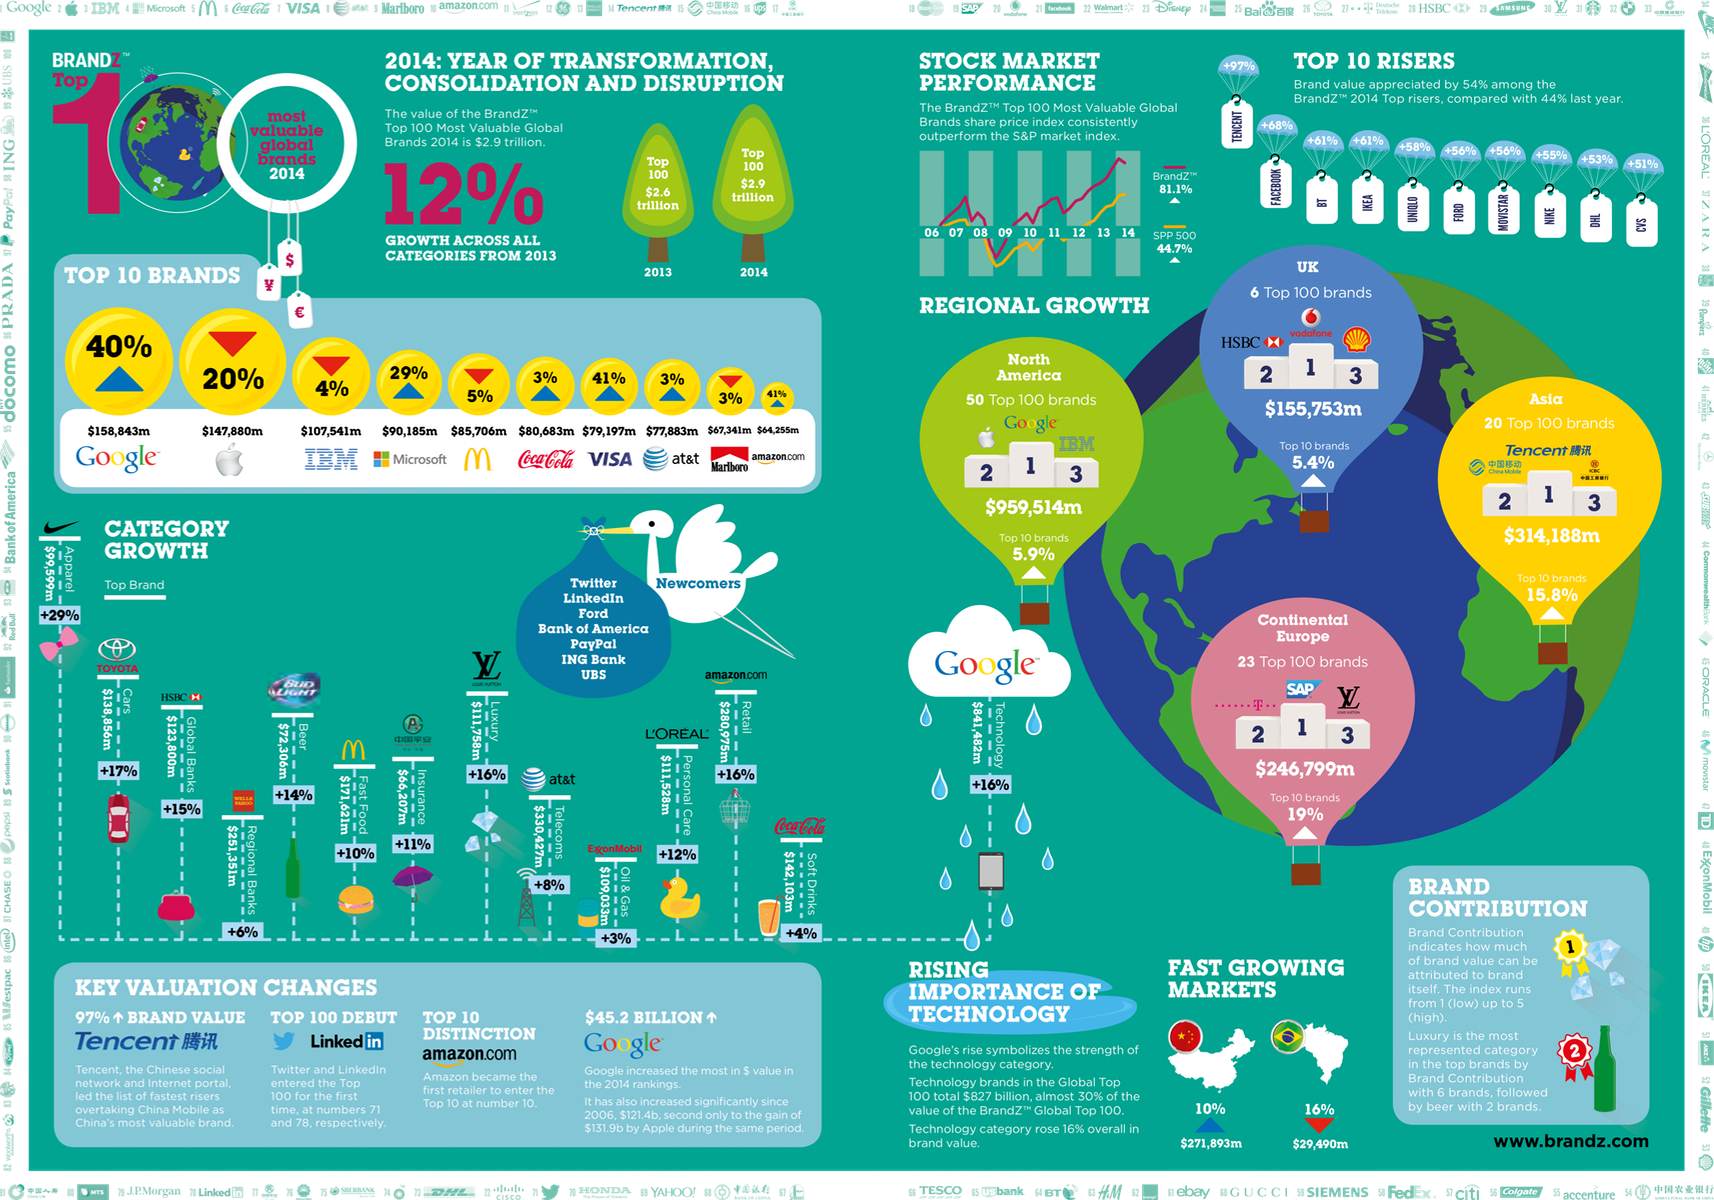 BrandZ 2014 infographic